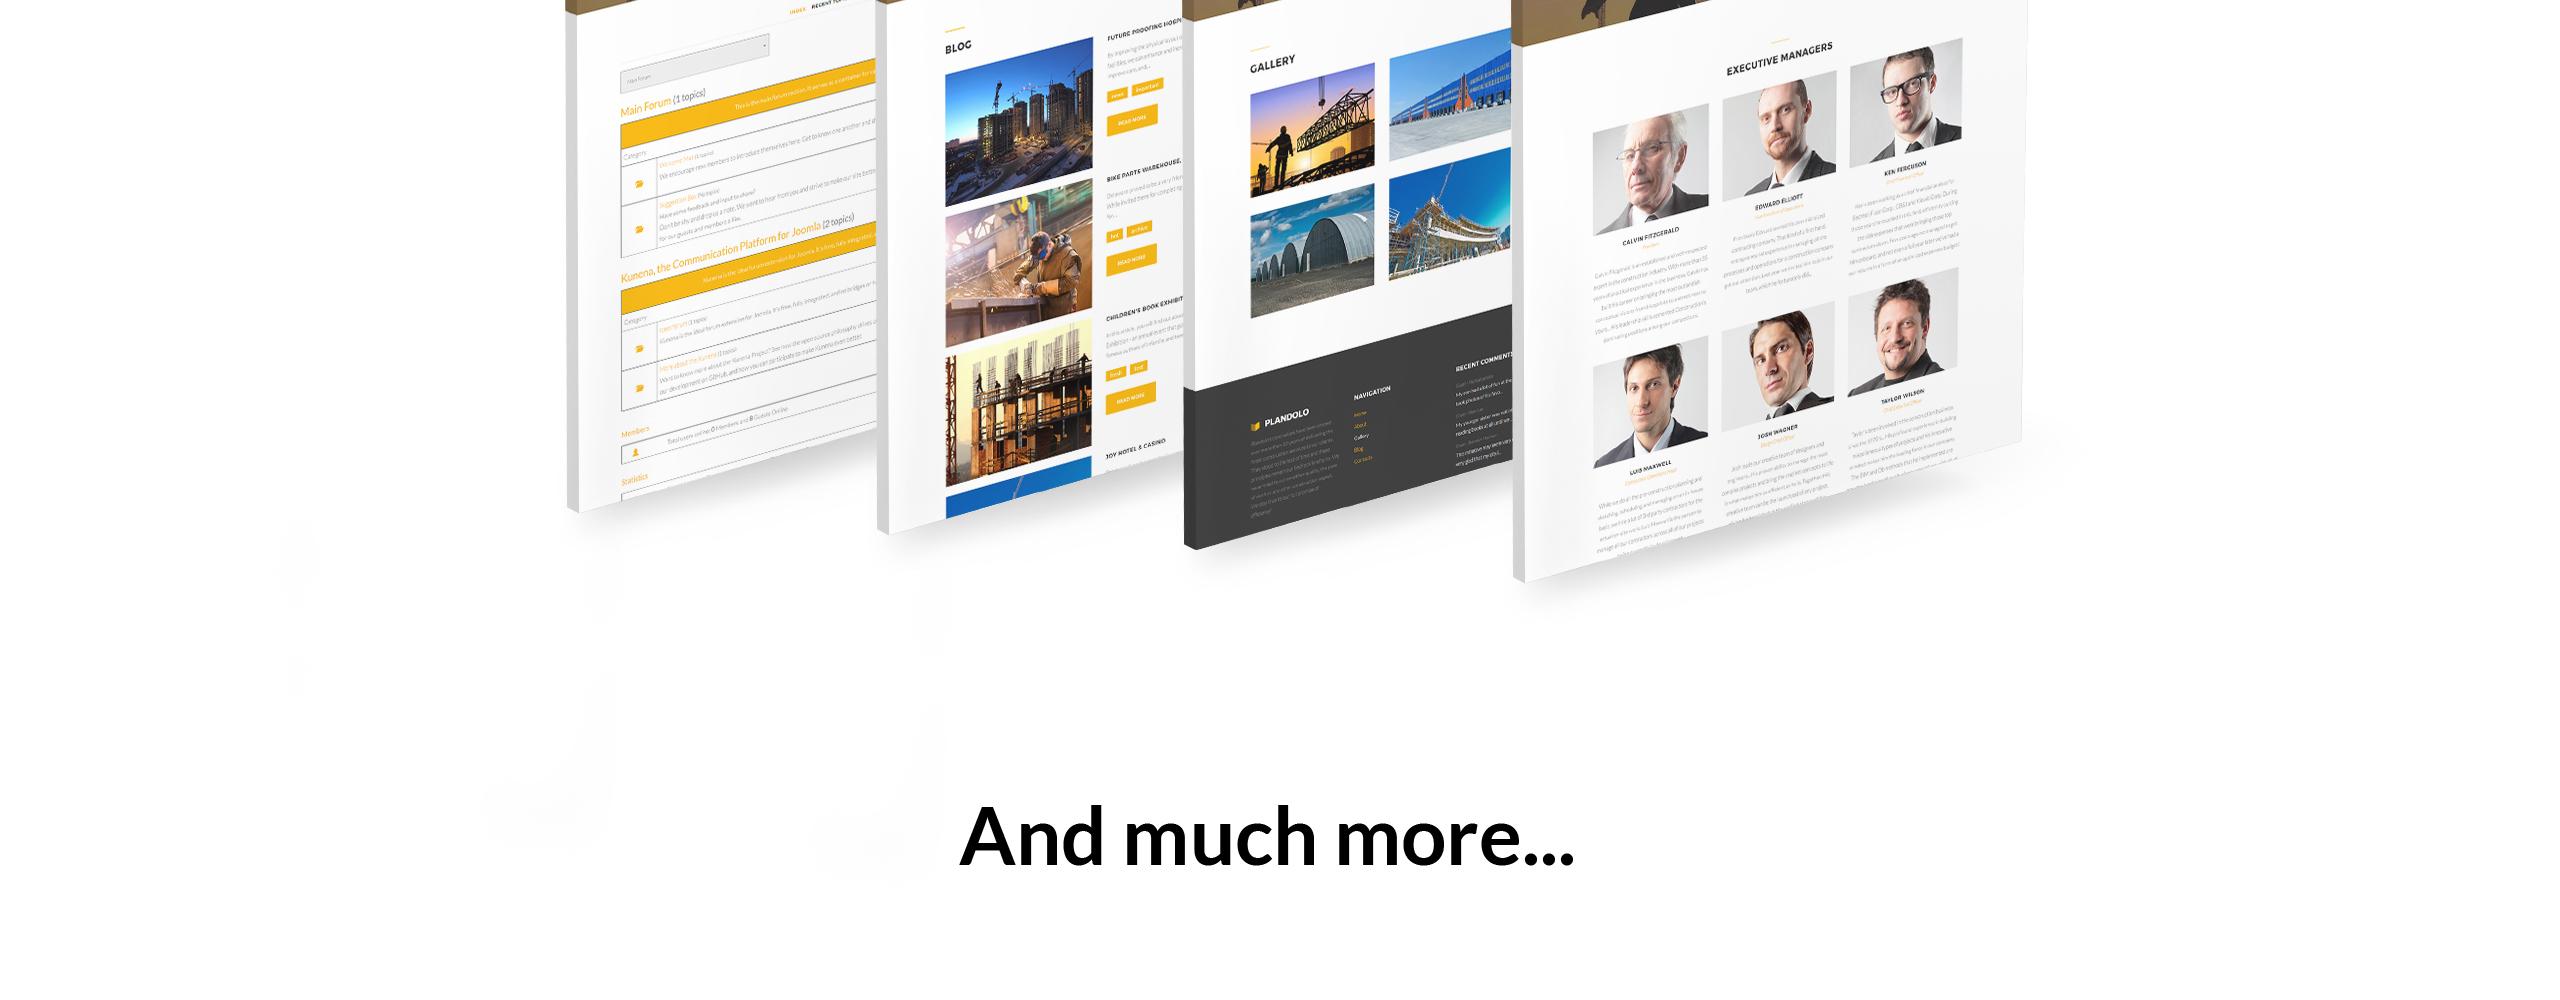 Website Design Template 74545 - company construction industrial joomla